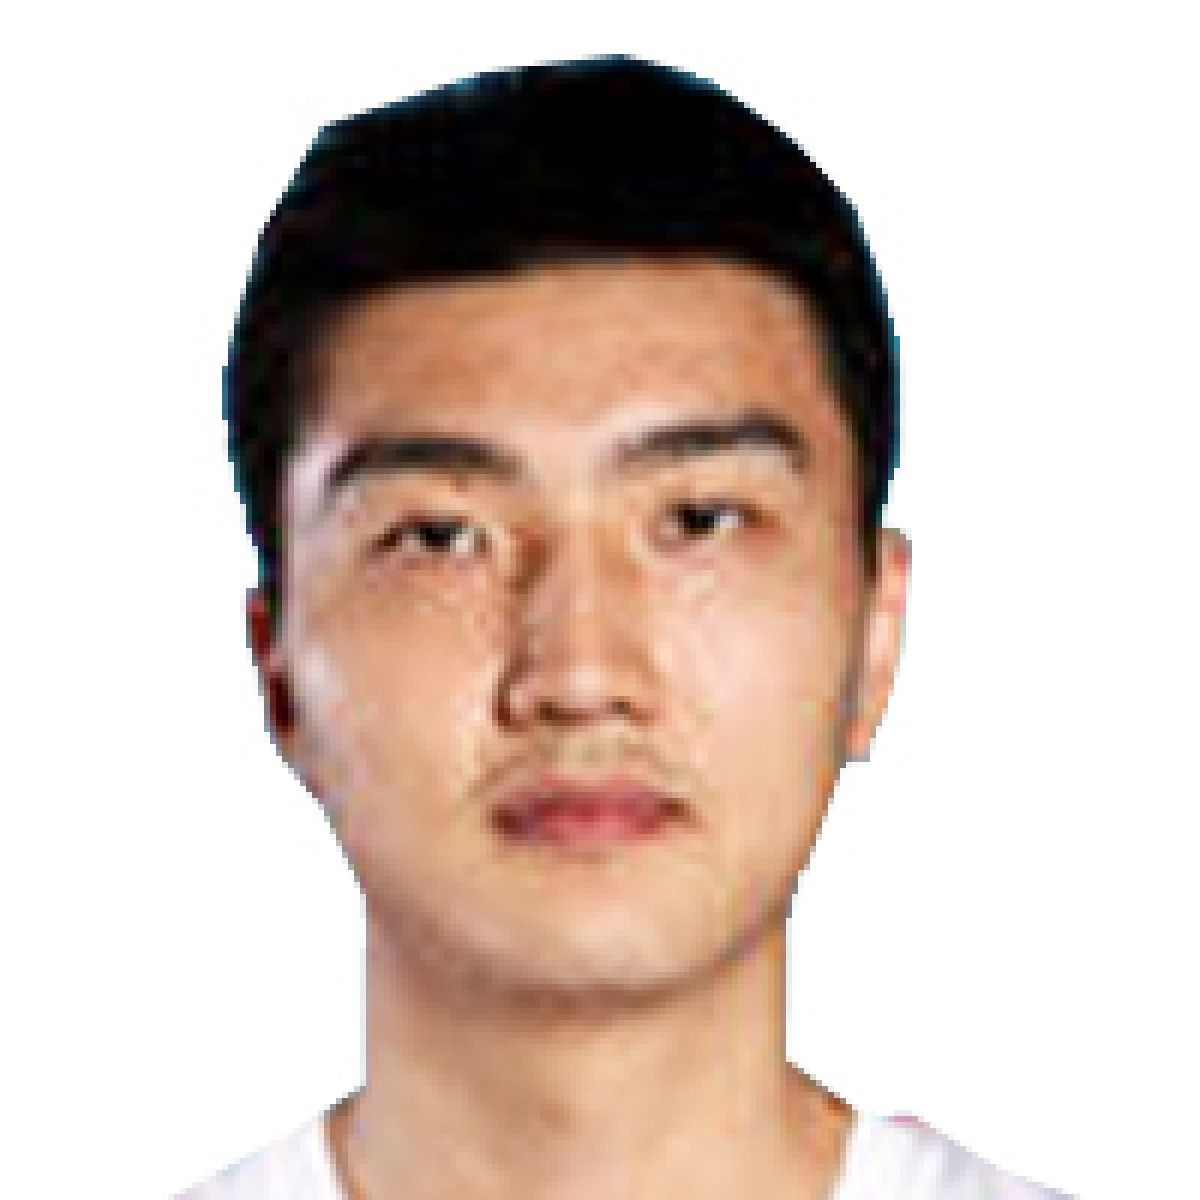 Zhi Luo